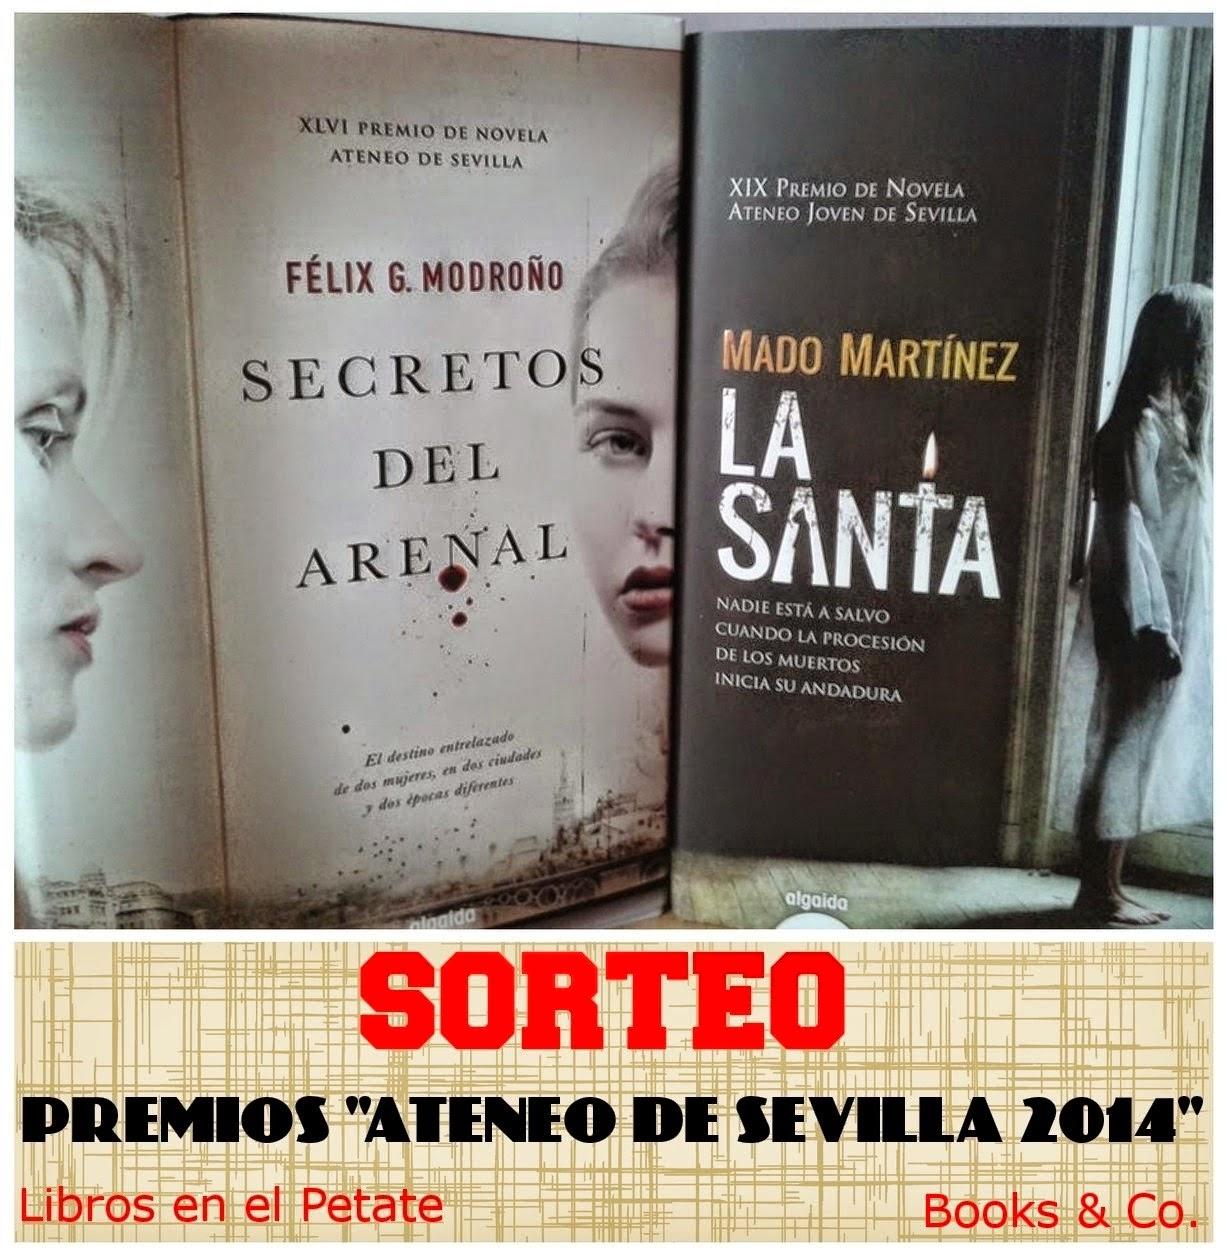 http://booksandcompanies.blogspot.com.es/2014/10/sorteo-premios-ateneo-2014-secretos-del.html